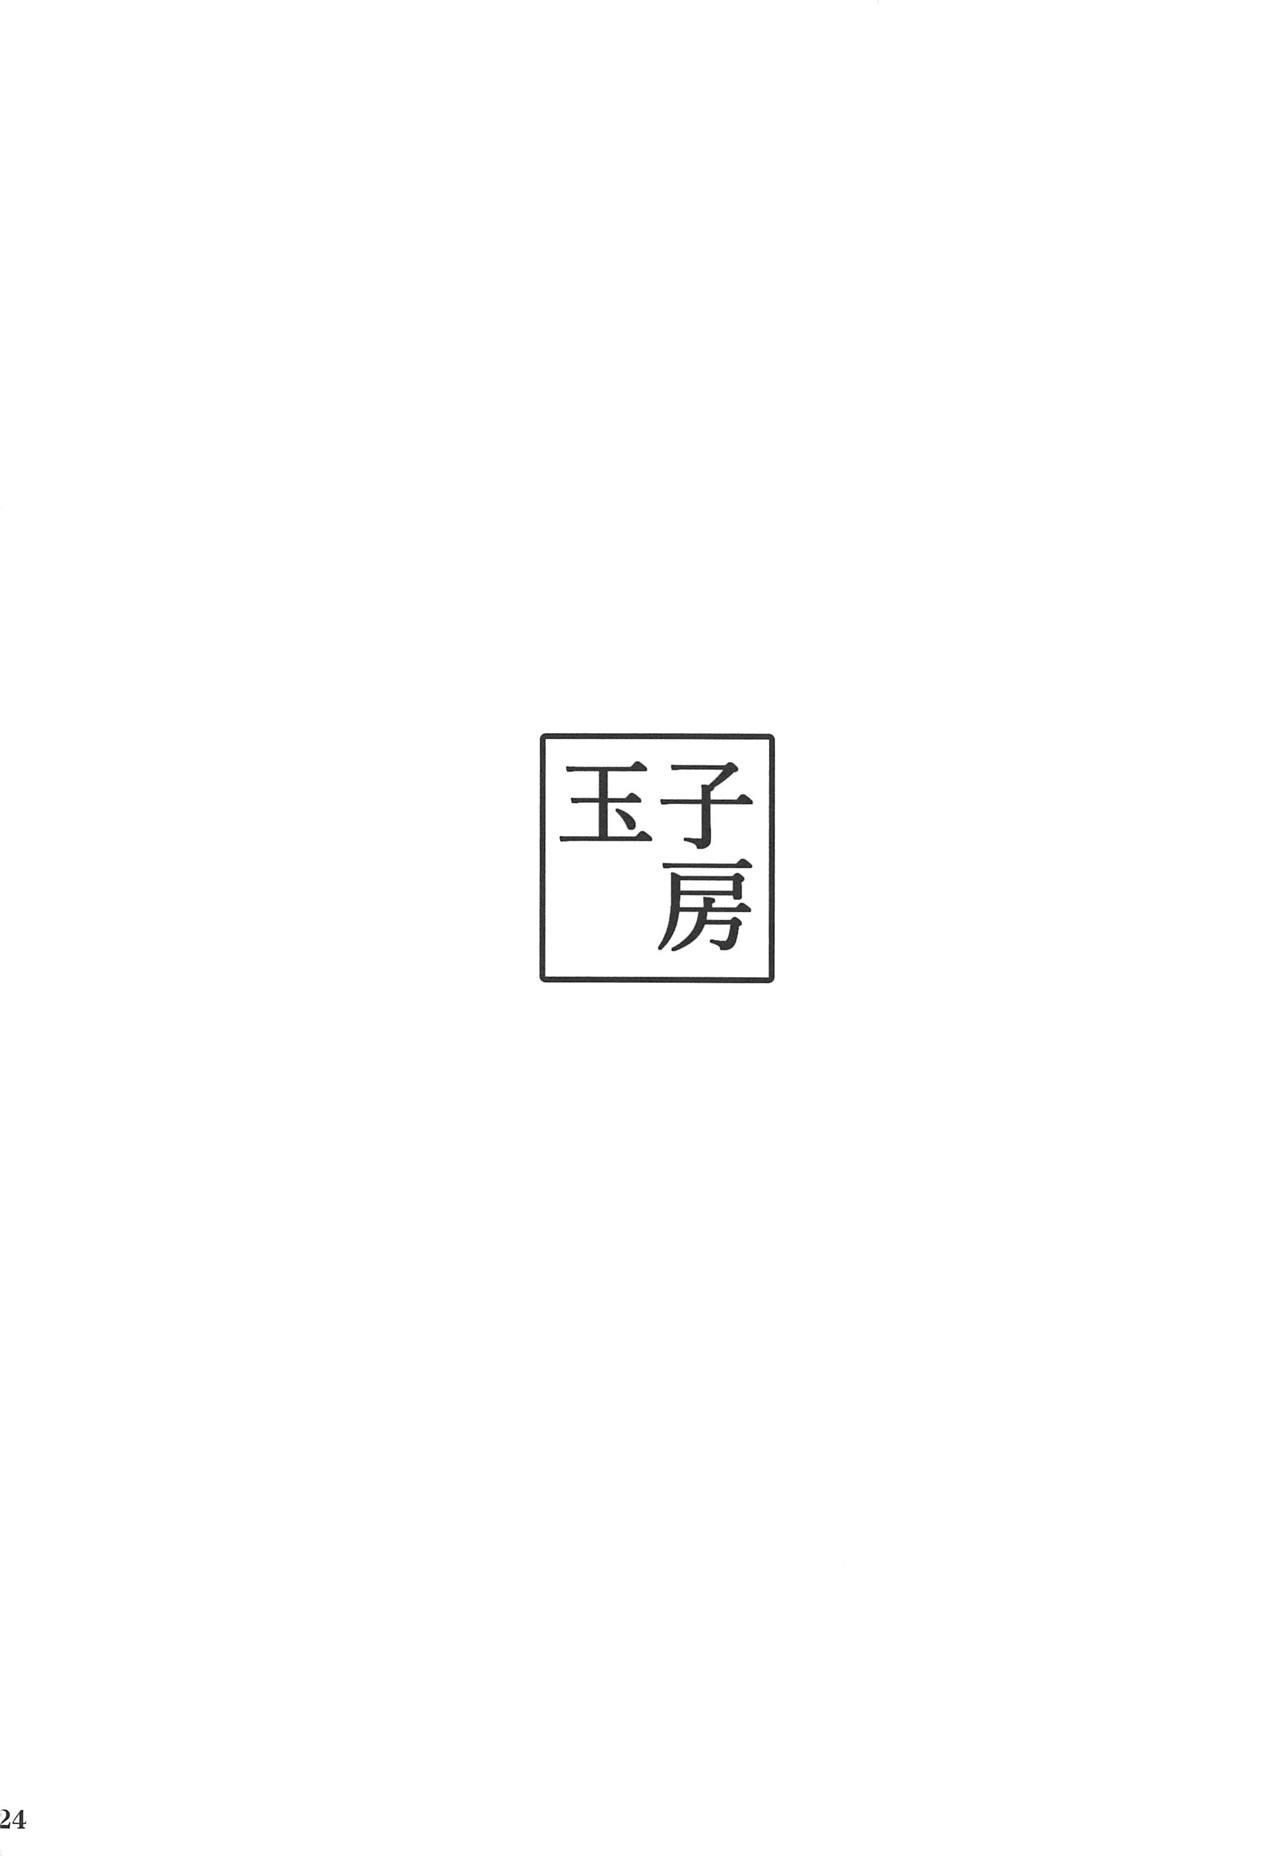 (COMIC1☆15) [Tamagobou (Kumakiti)] Musashi-chan Oji-san ni Kussuru (Fate/Grand Order) [Chinese] [新桥月白日语社] 25